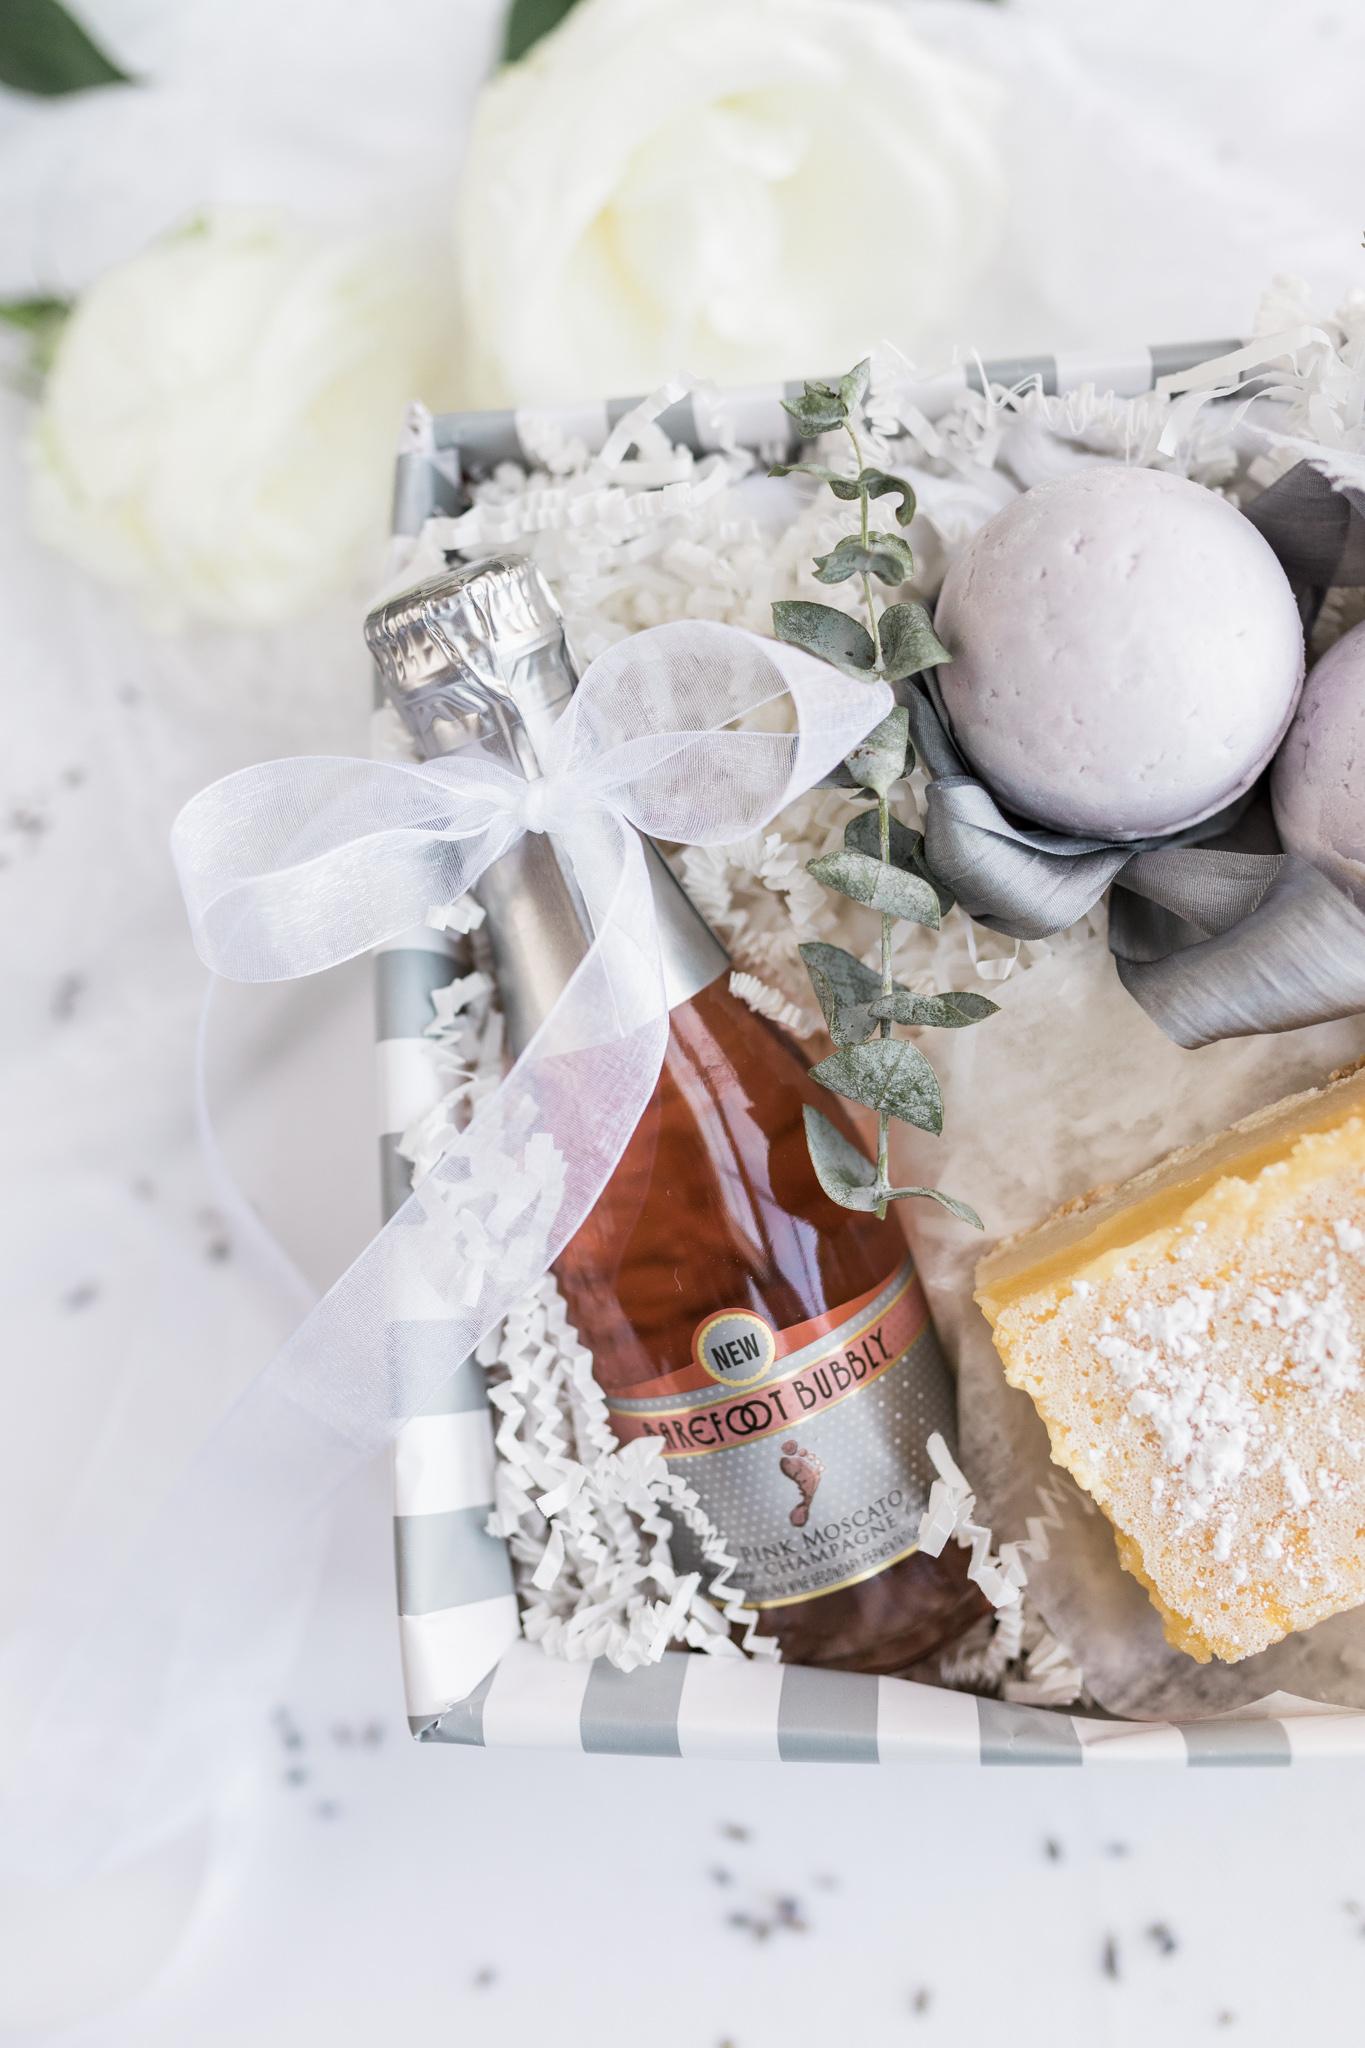 Bridal party gift | DIY Gift Basket | Homemade Lemon Bars | Homemade Bath Bombs